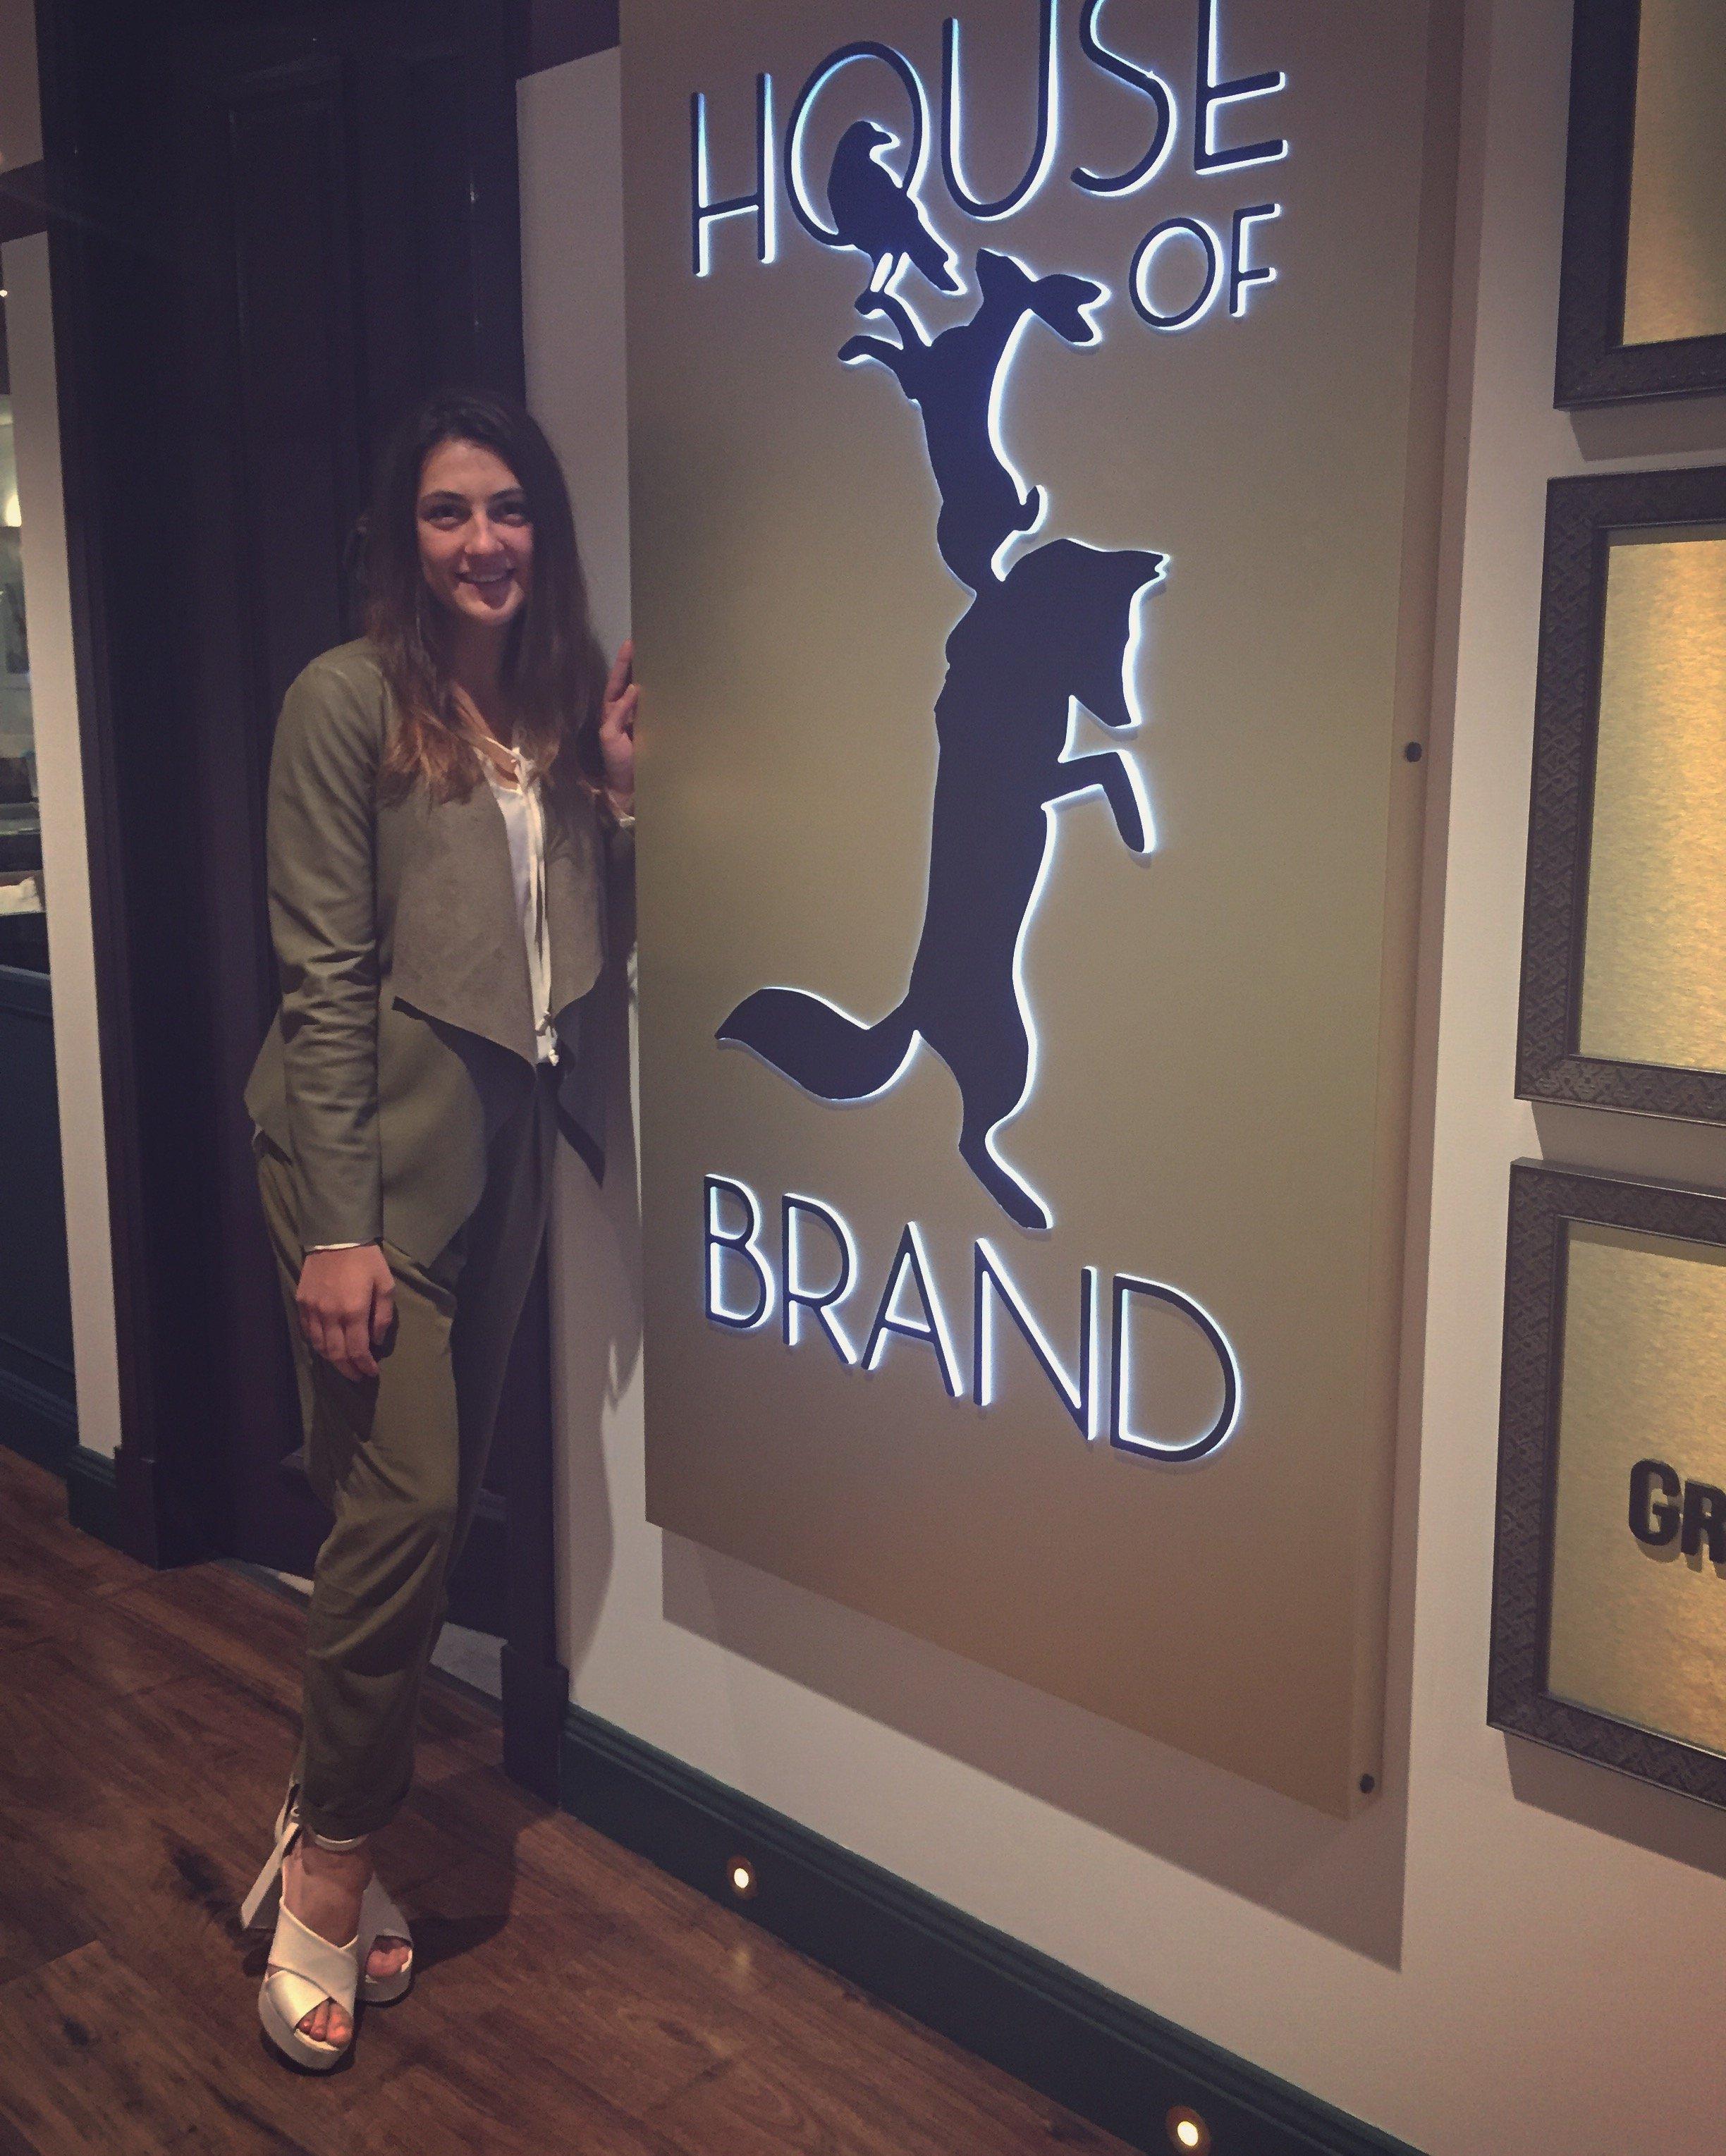 CAPAStudyAbroad_Sydney_Fall2017_From Hanna Okhrimchuk - Internship at House of Brand_1.jpeg